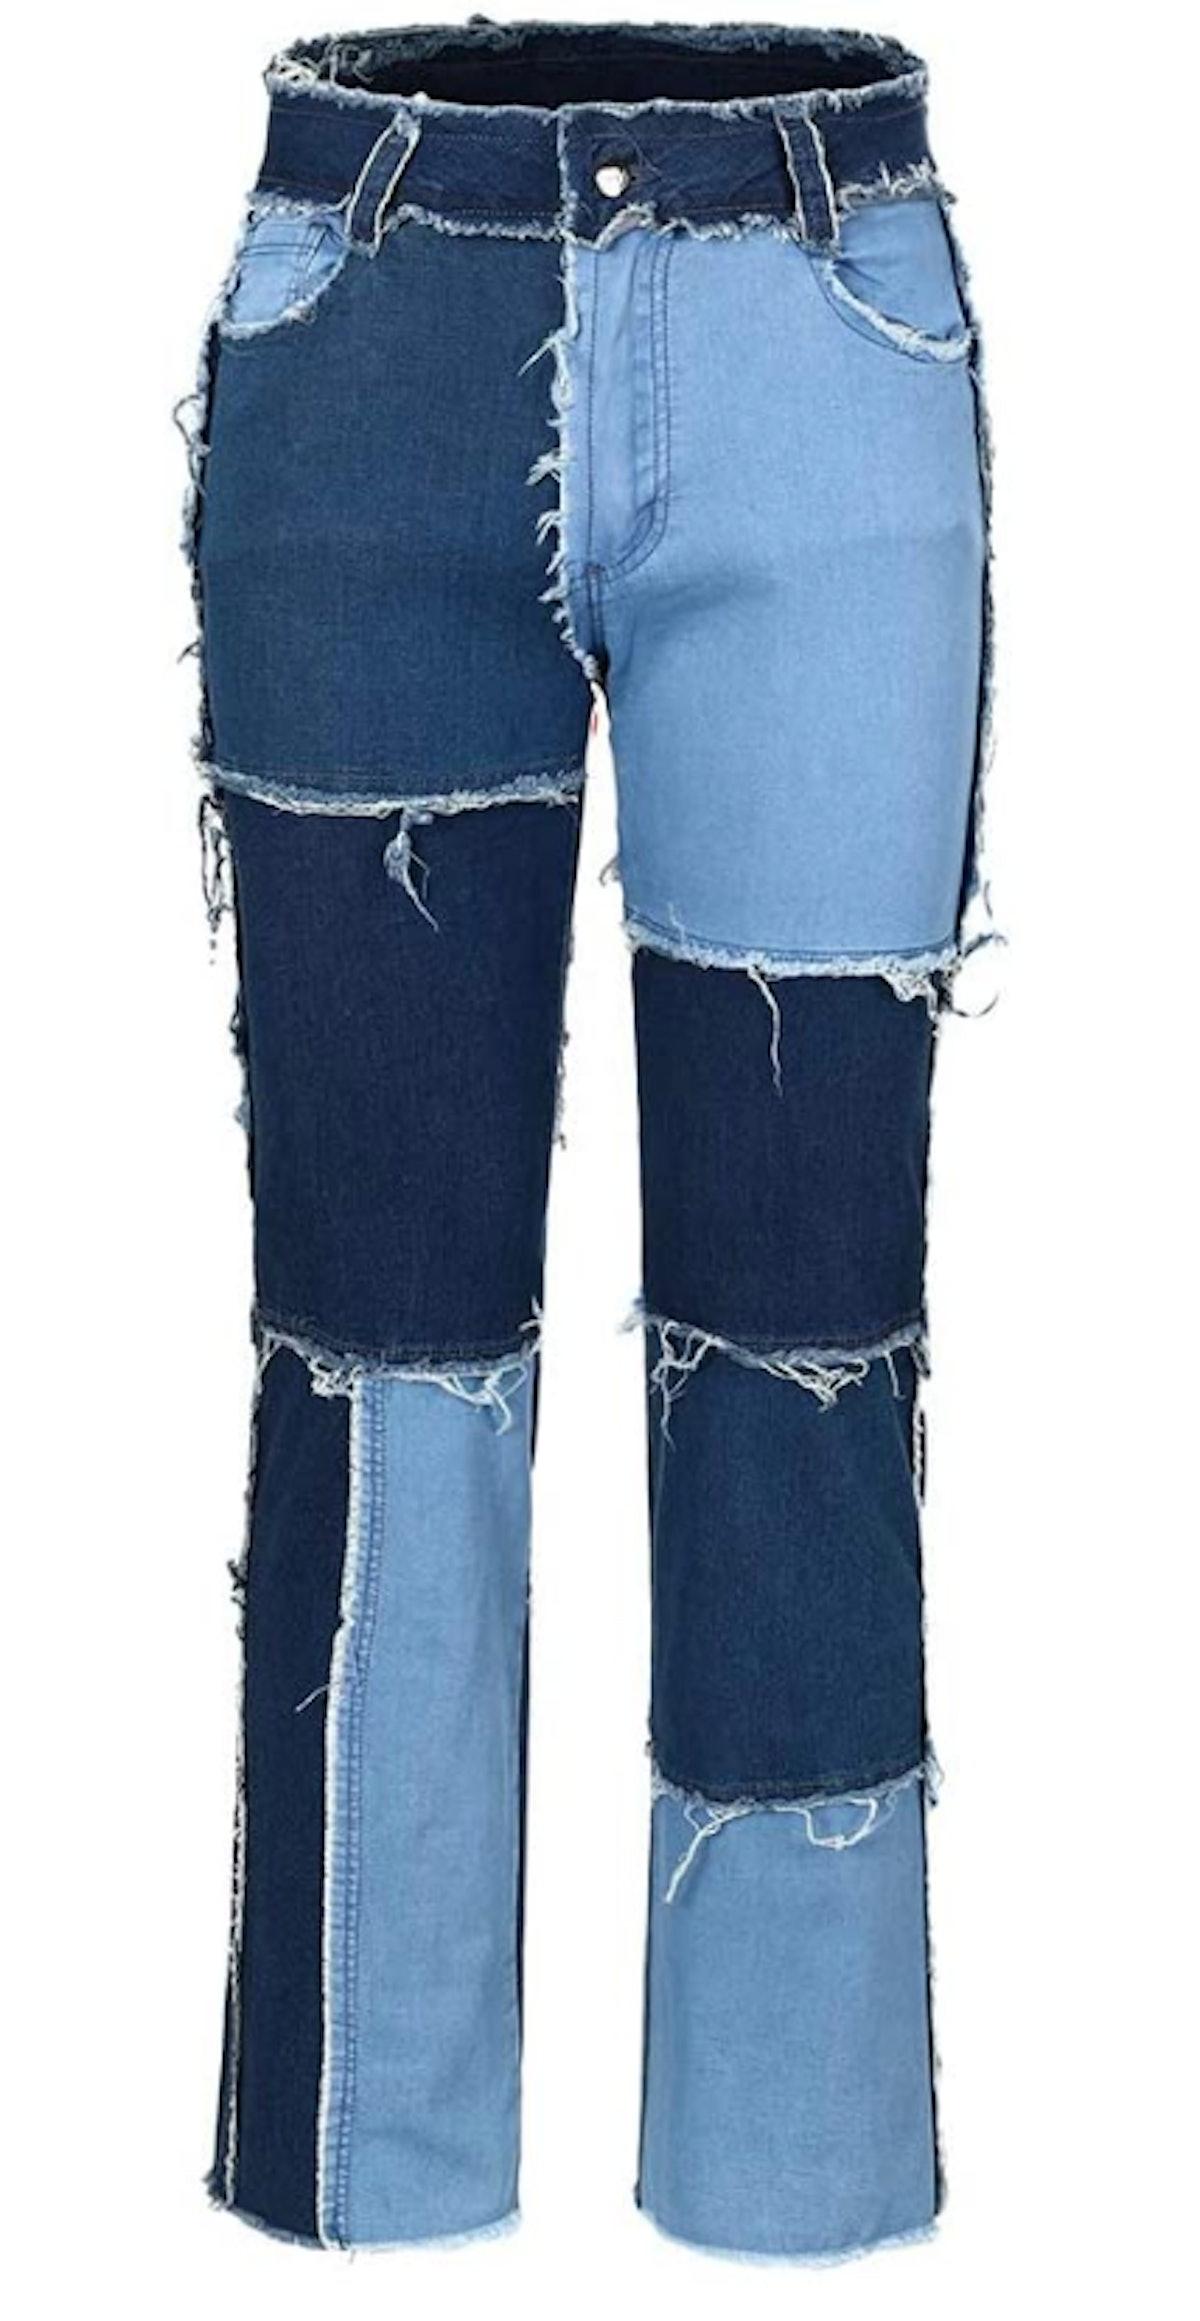 THUNDER STAR's patchwork straight leg jeans.